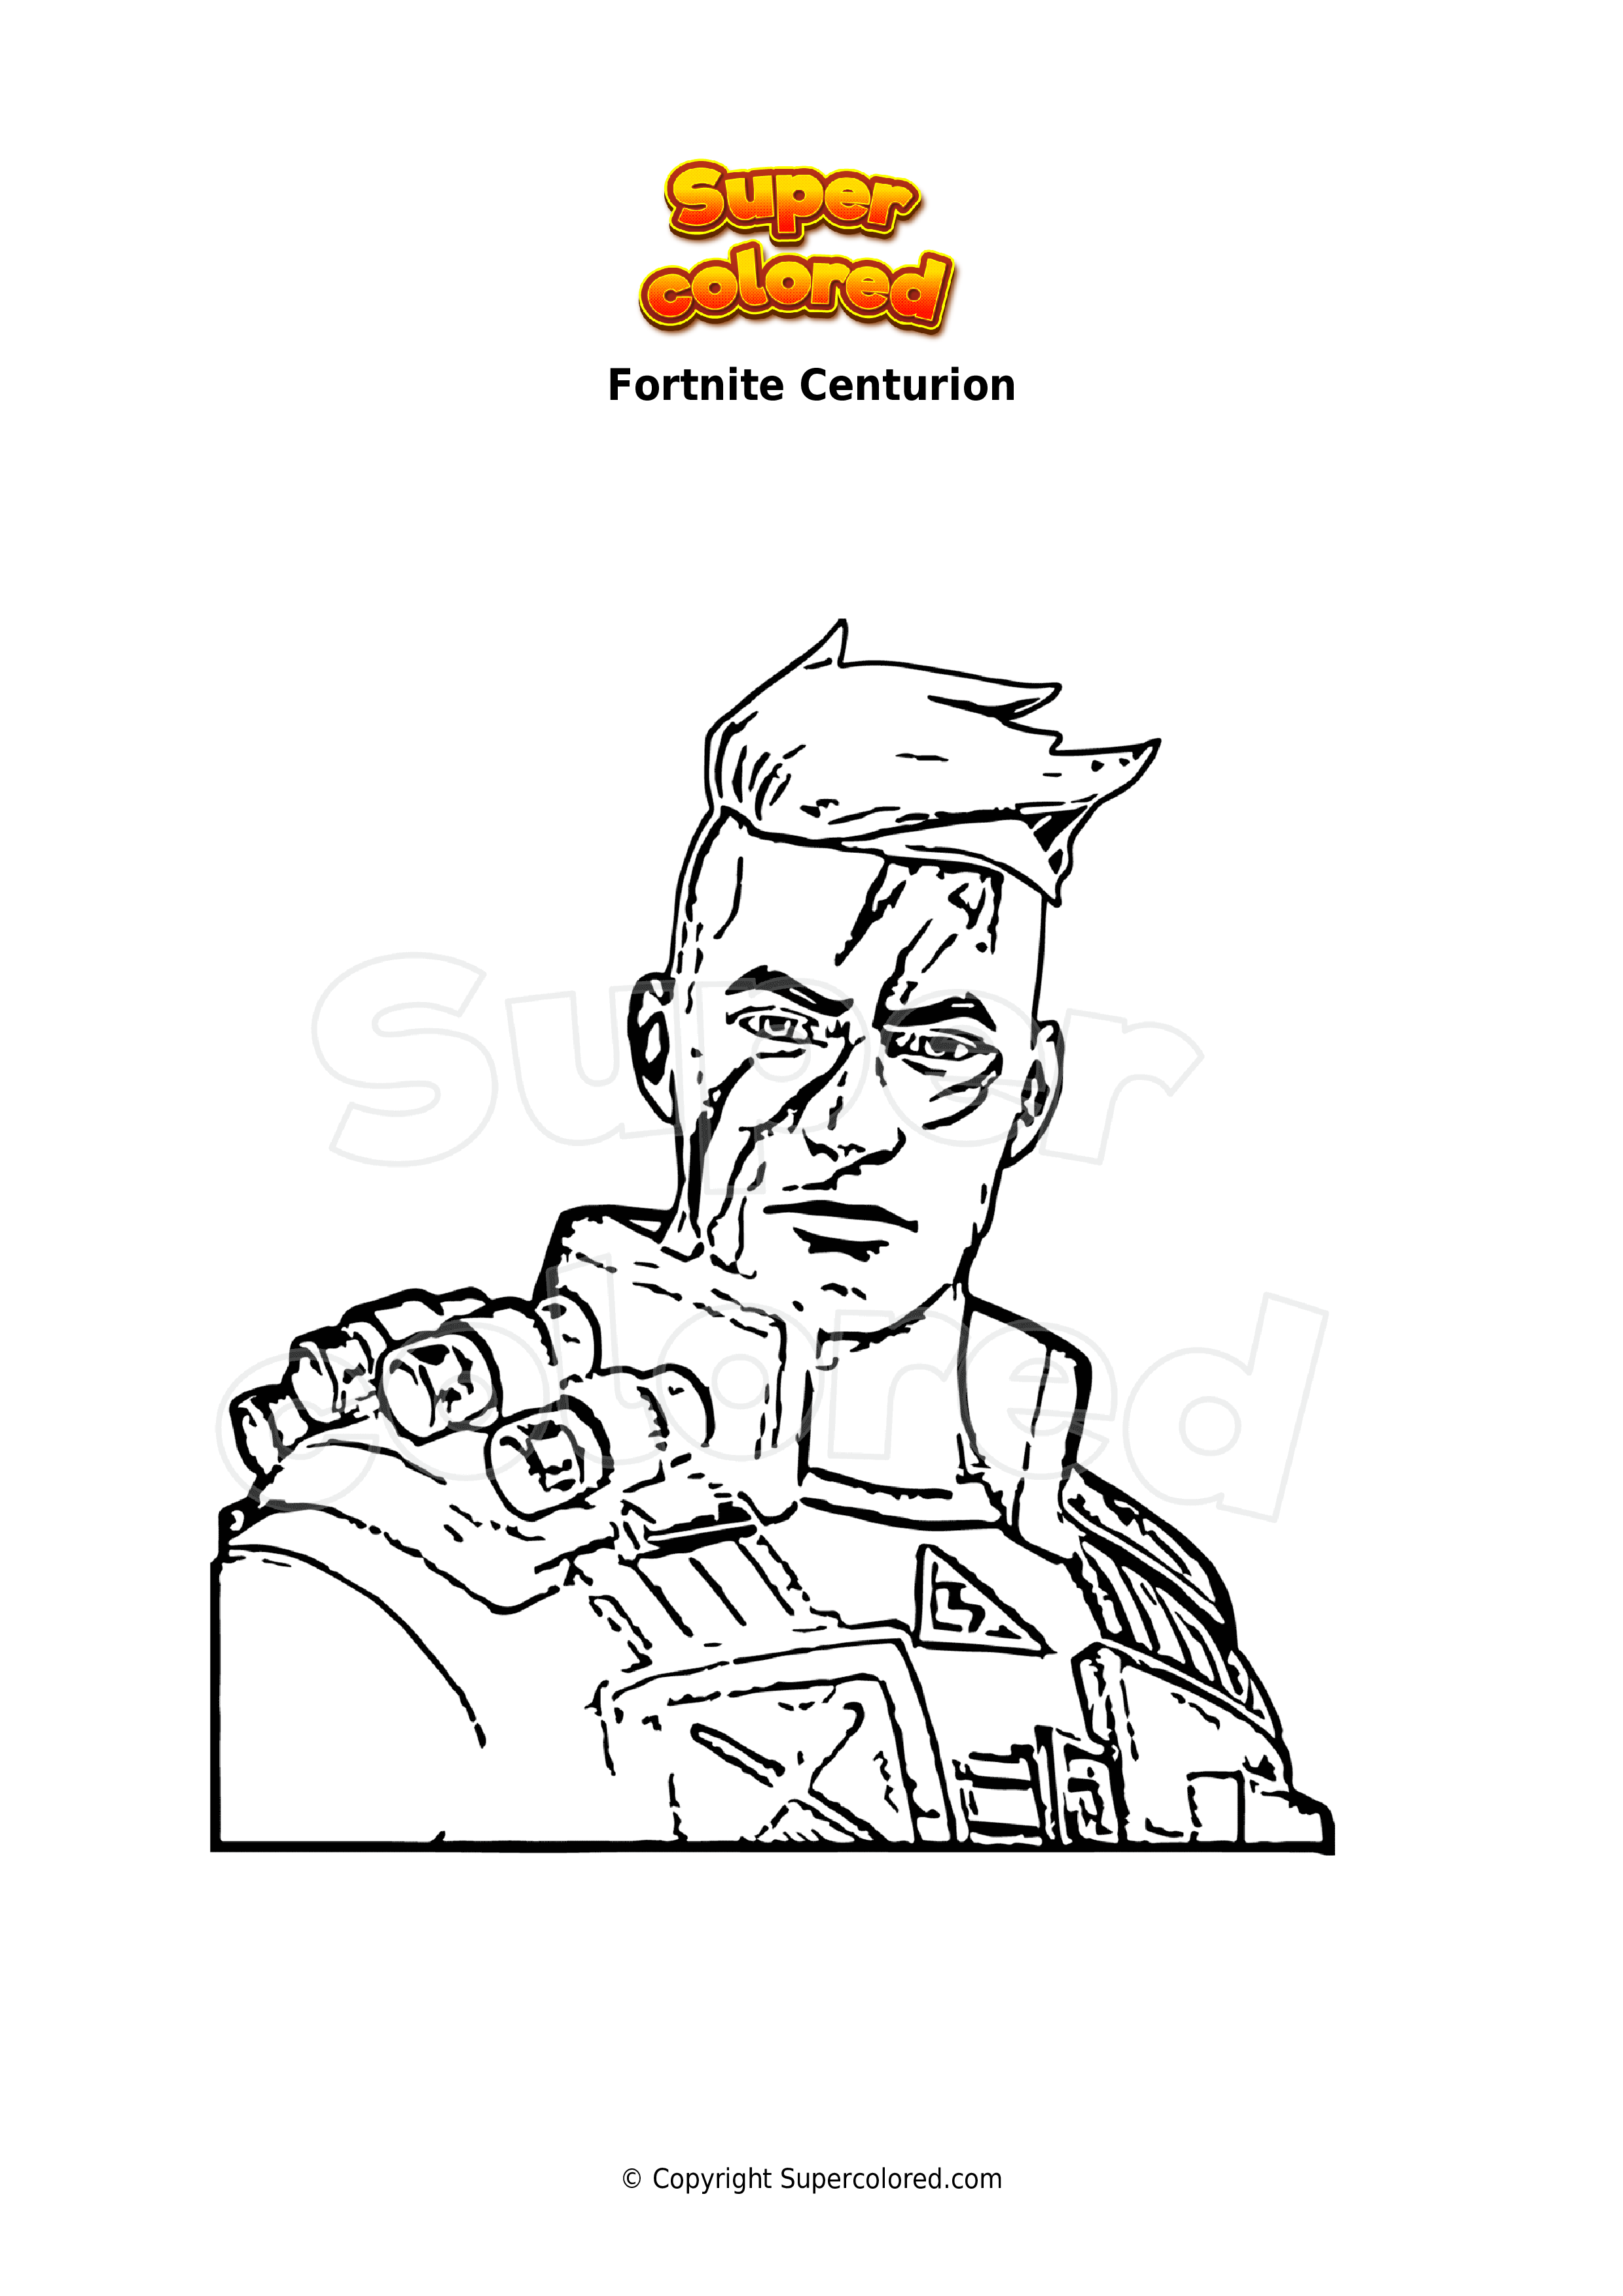 Ausmalbild Fortnite Centurion - Supercolored.com